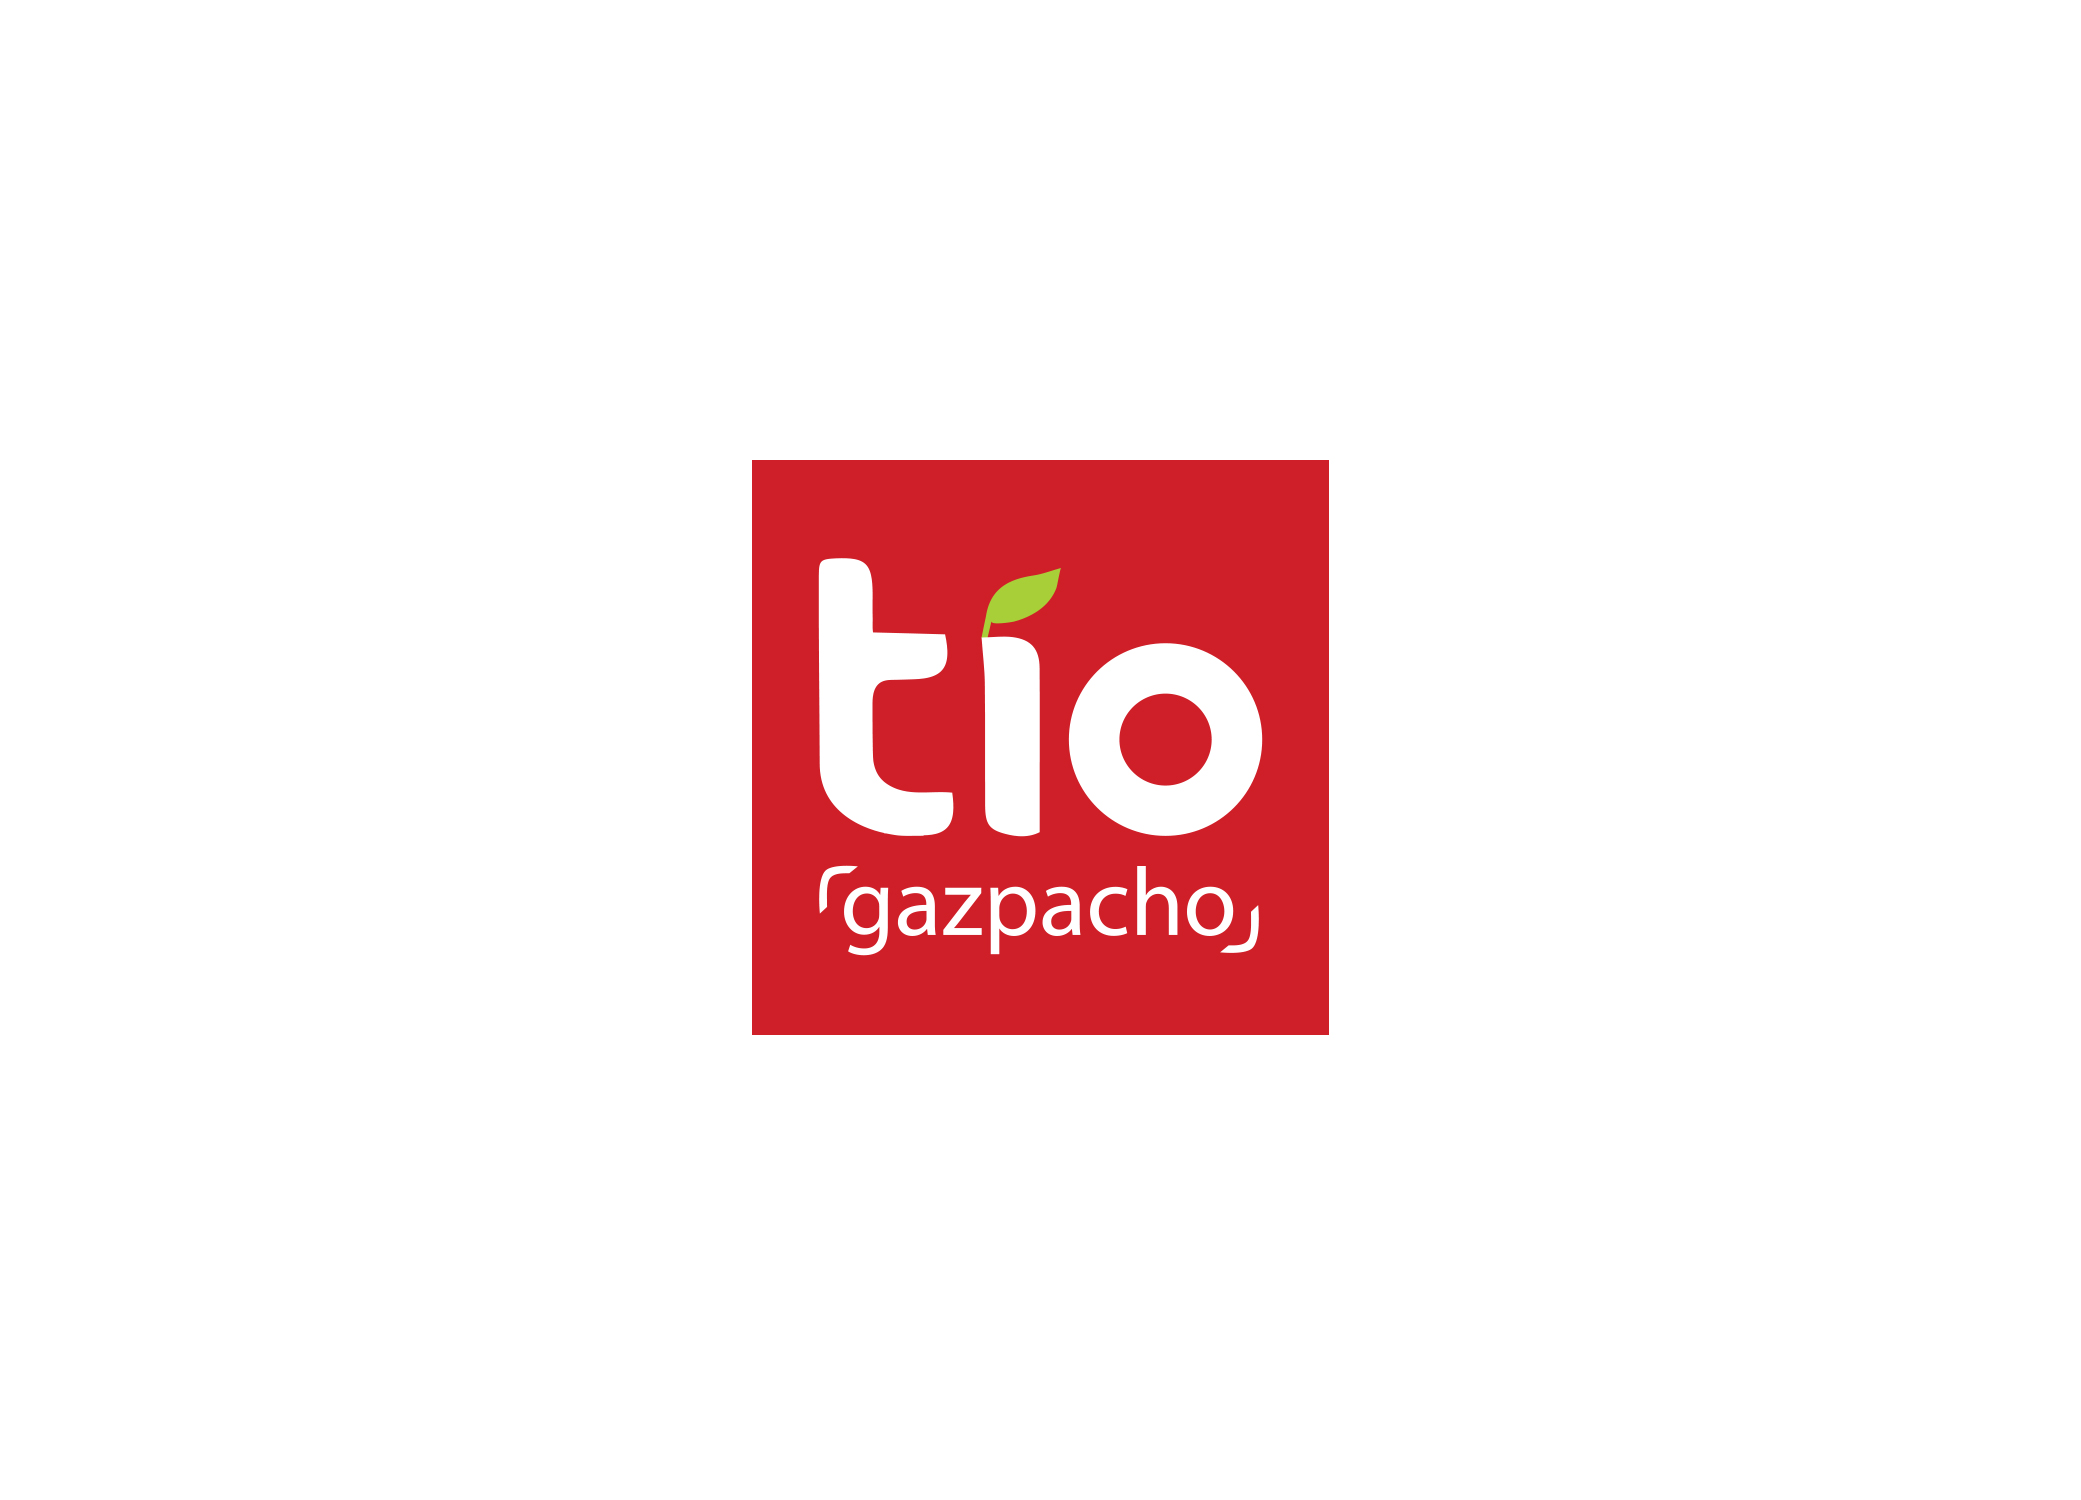 Tio_Gazpacho_Brand_Identity_Design